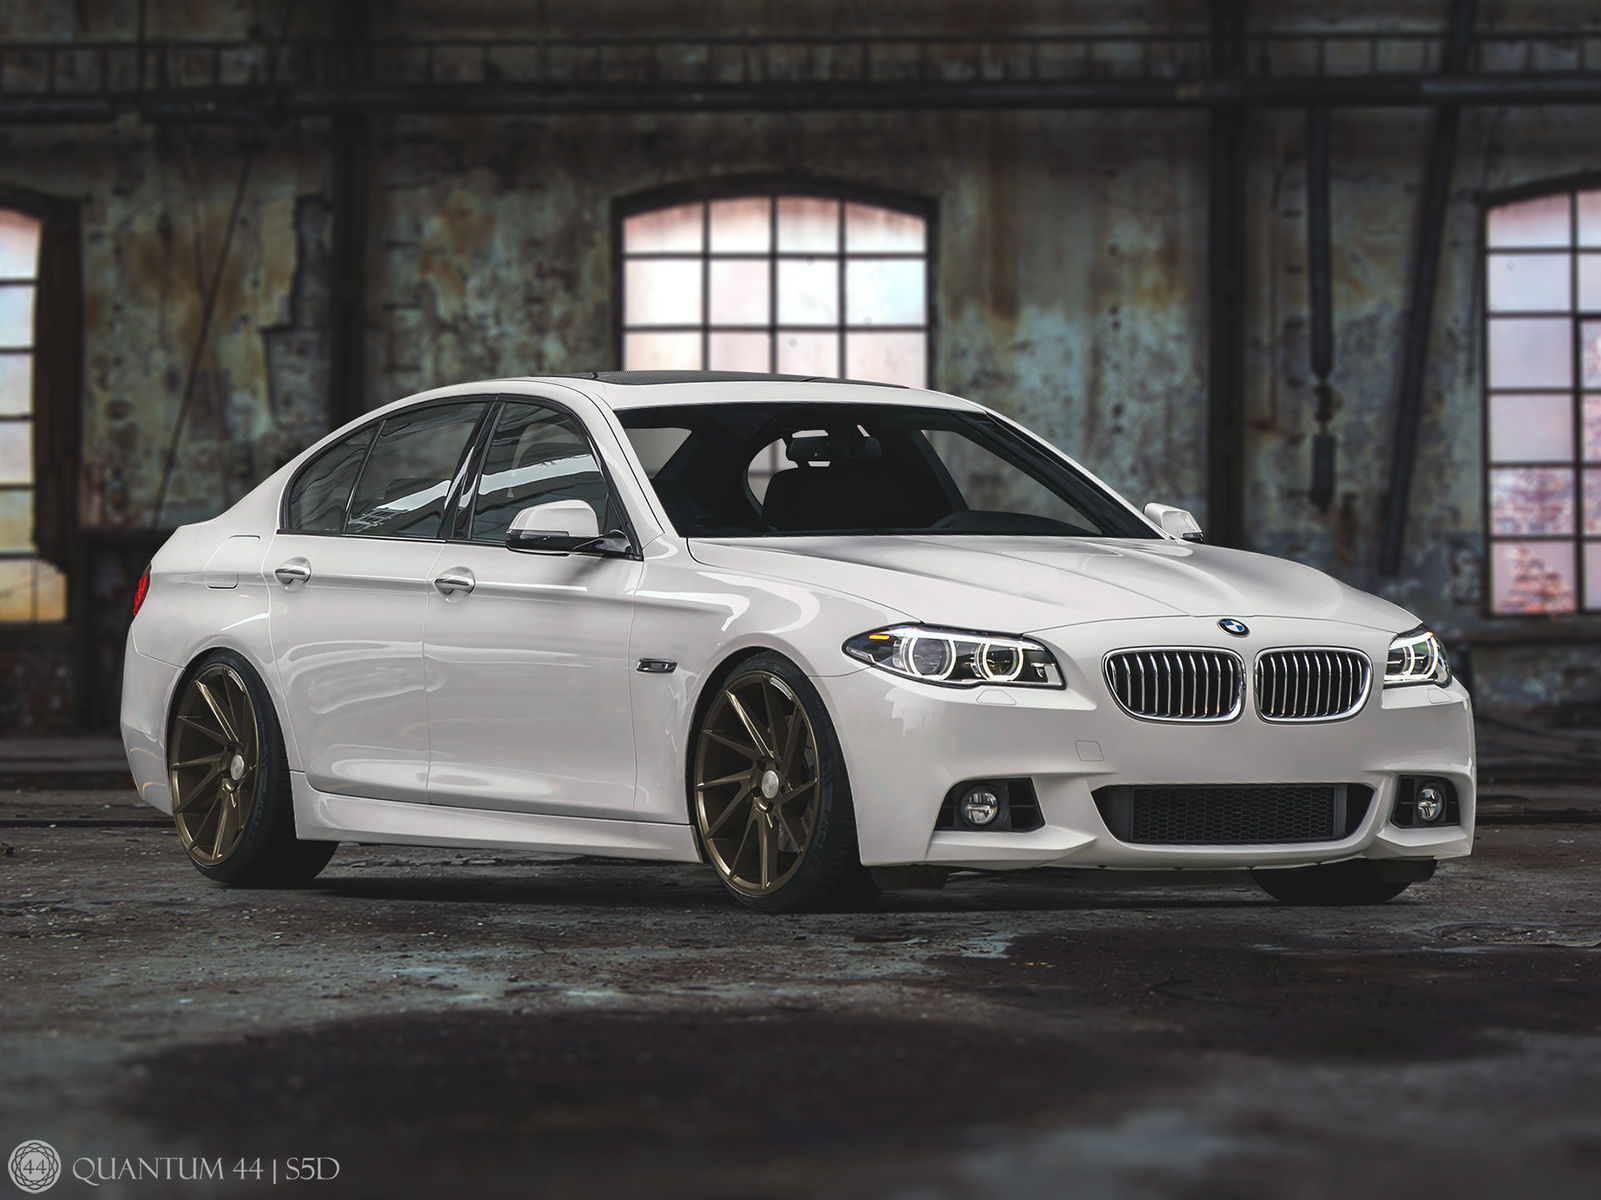 BMW 5 Series | Quantum44 S5D - BMW 535d